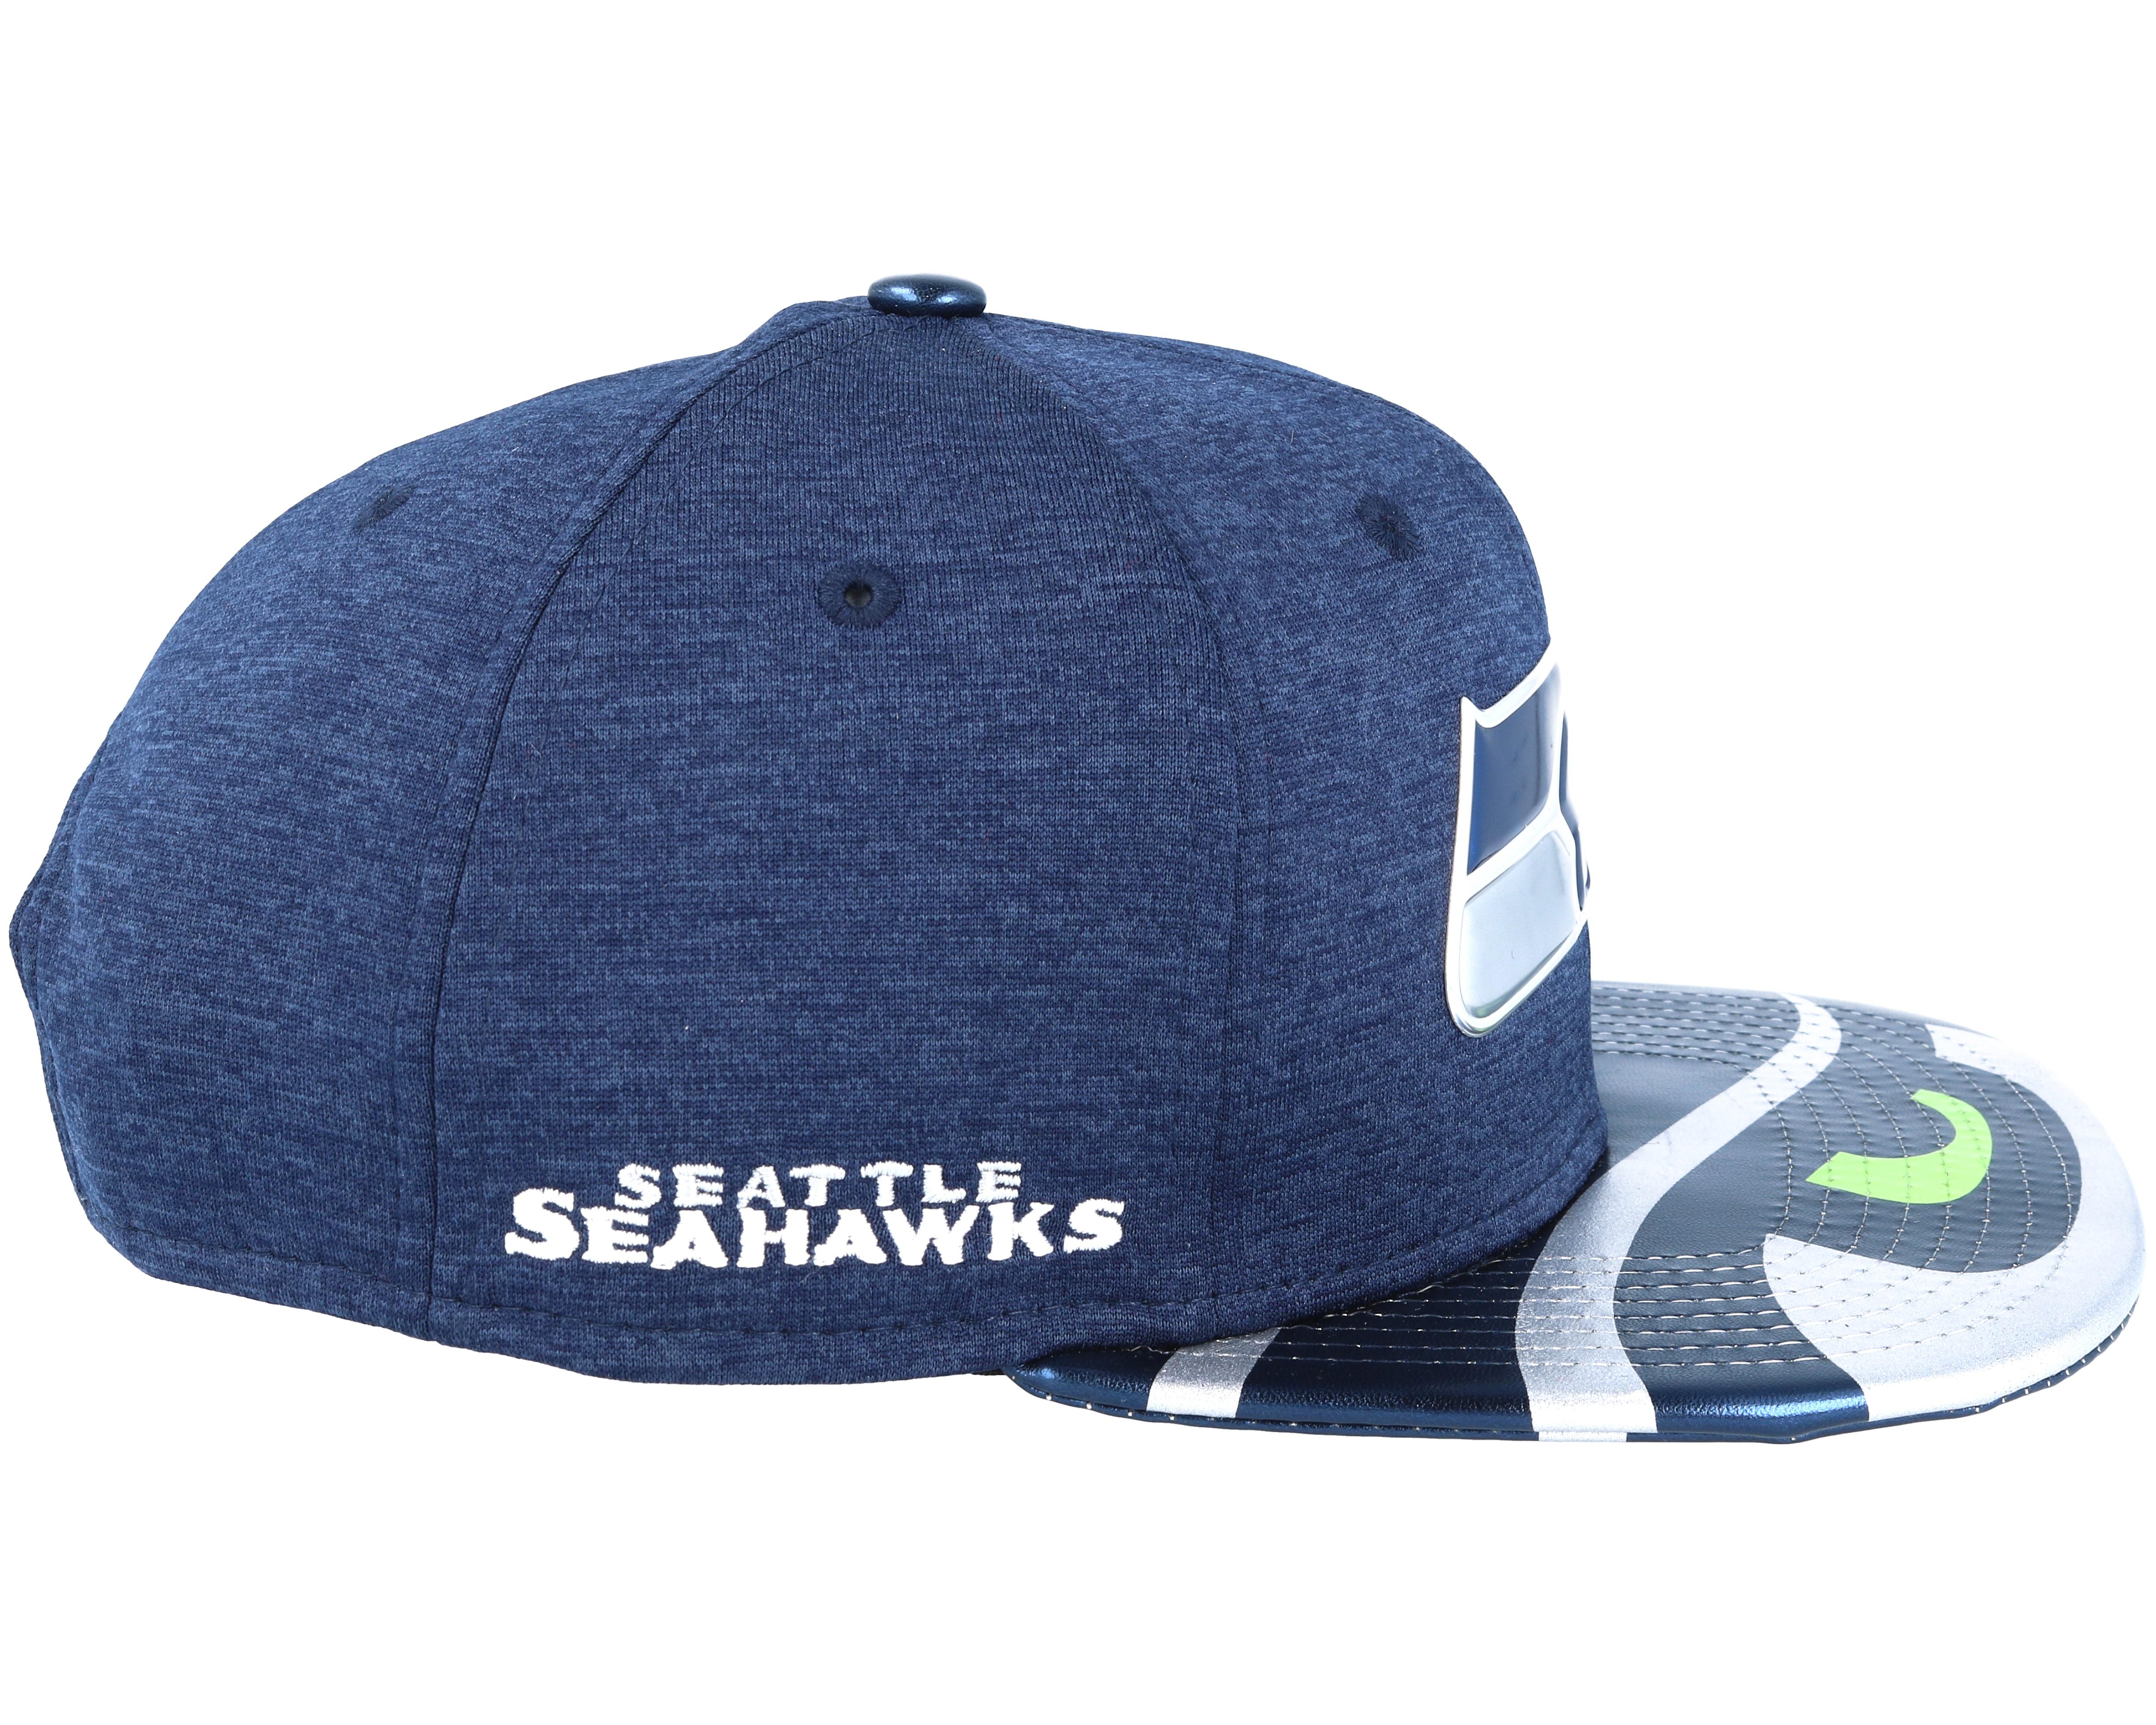 seattle seahawks draft 2017 9fifty navy snapback new era caps. Black Bedroom Furniture Sets. Home Design Ideas